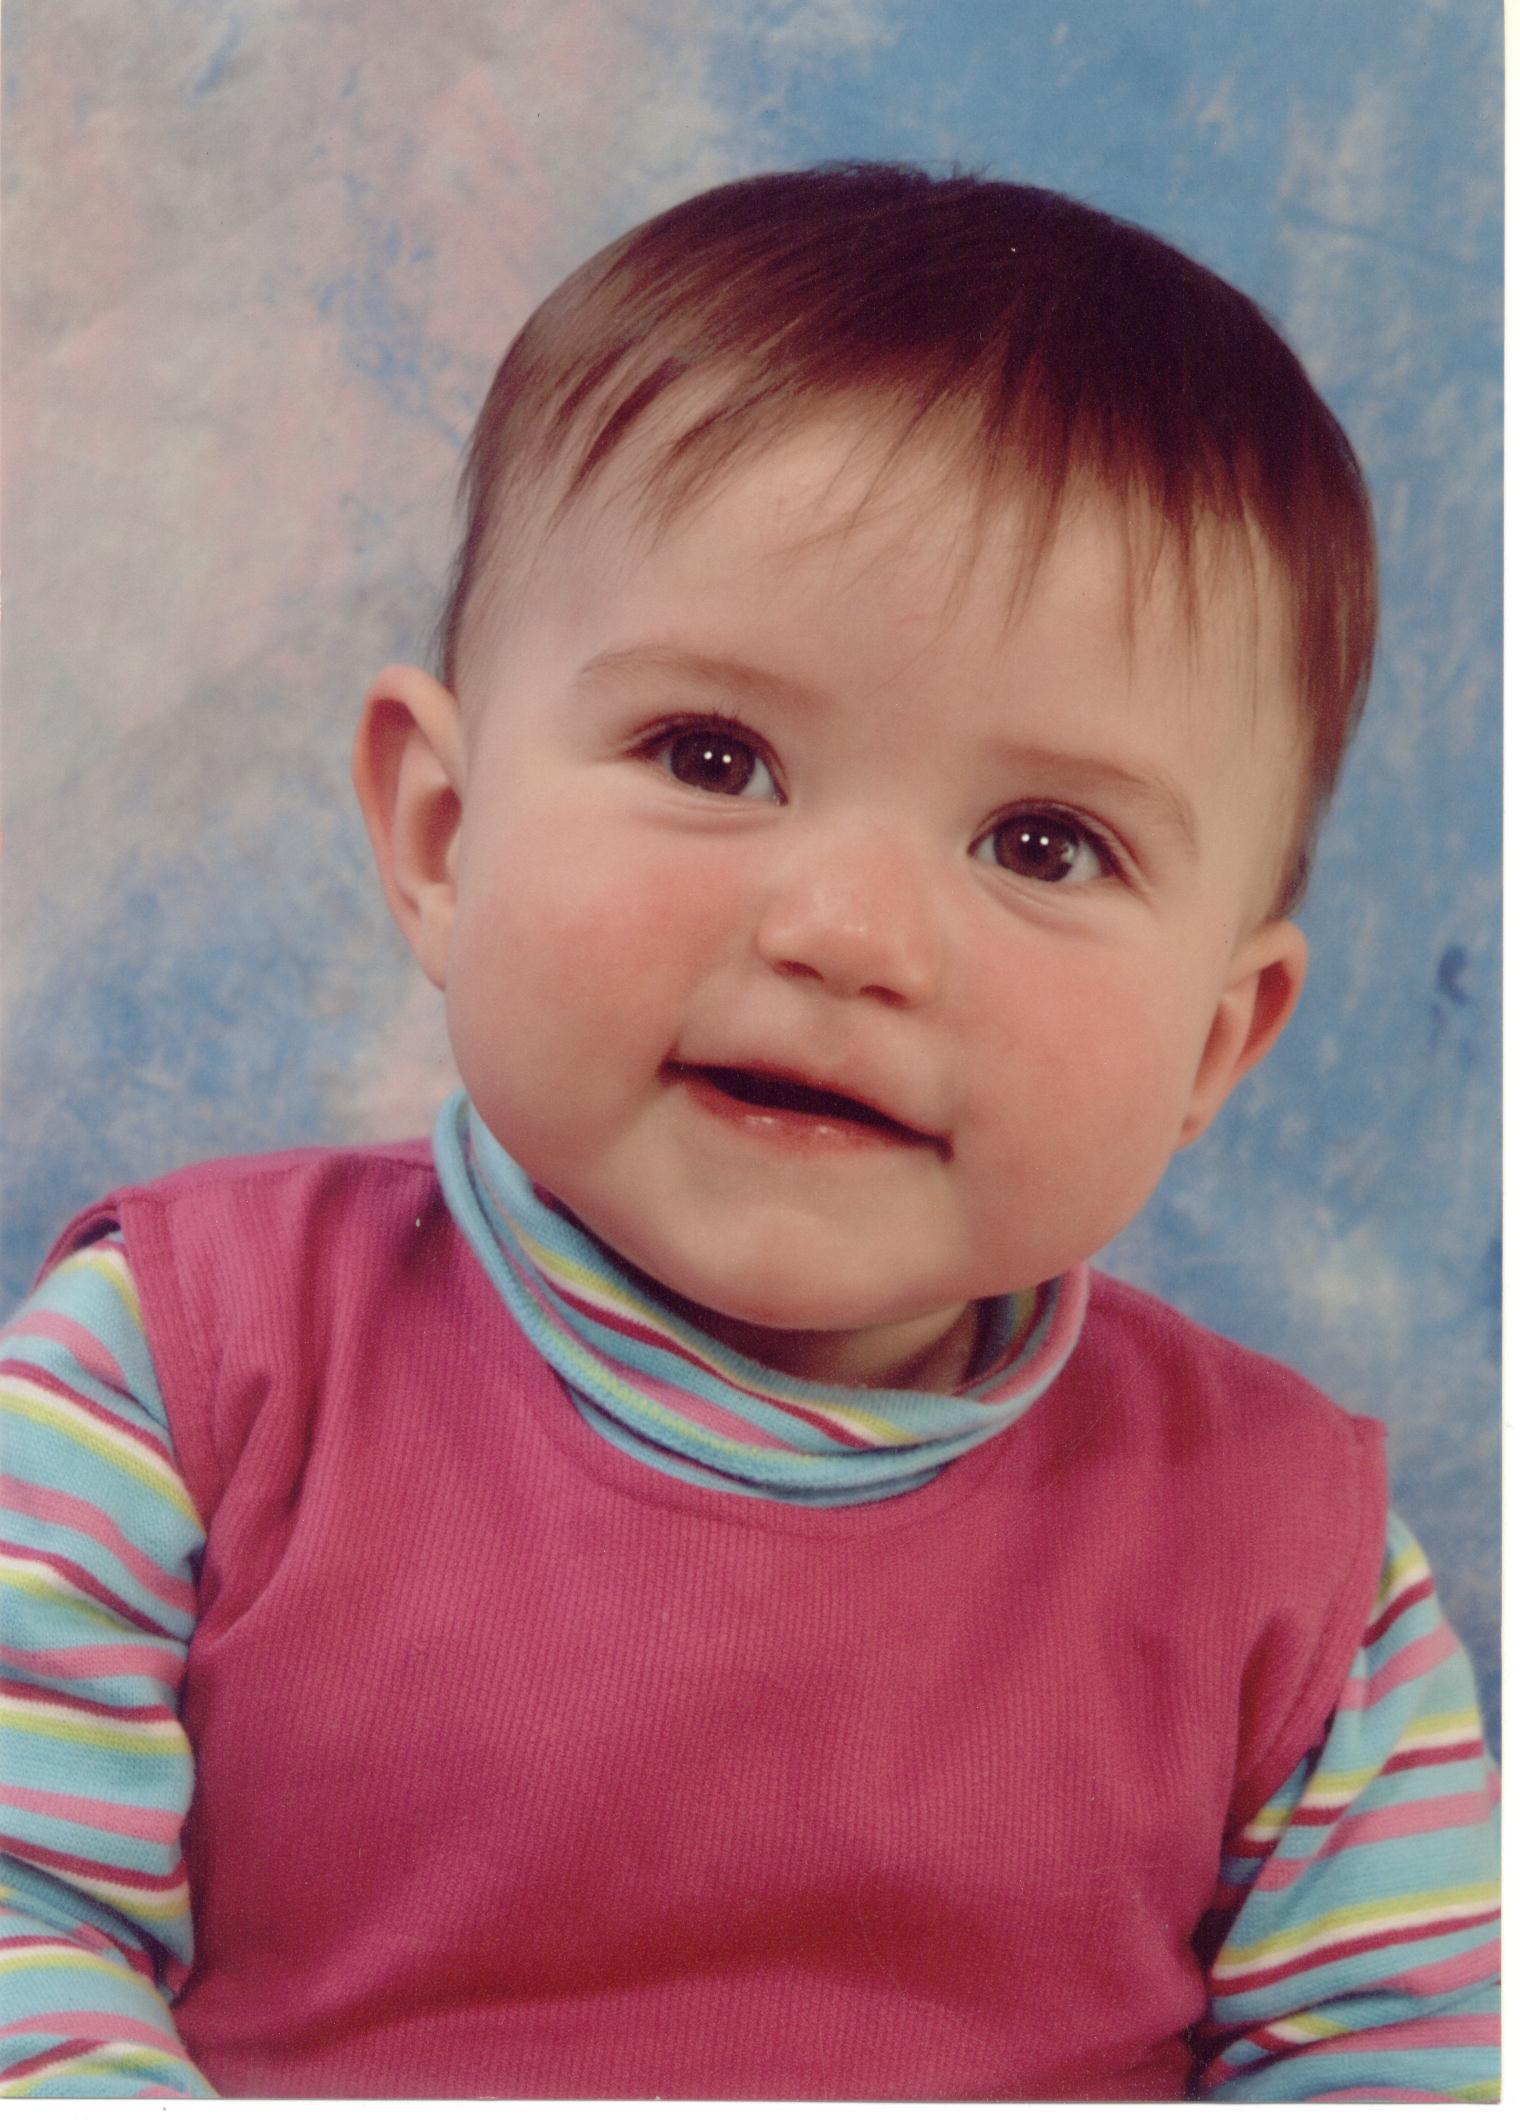 ANA JÚLIA Moratelli (*16/08/2005), trineta, filha de Marlene Dametto e Ladir Bruno Moratelli.